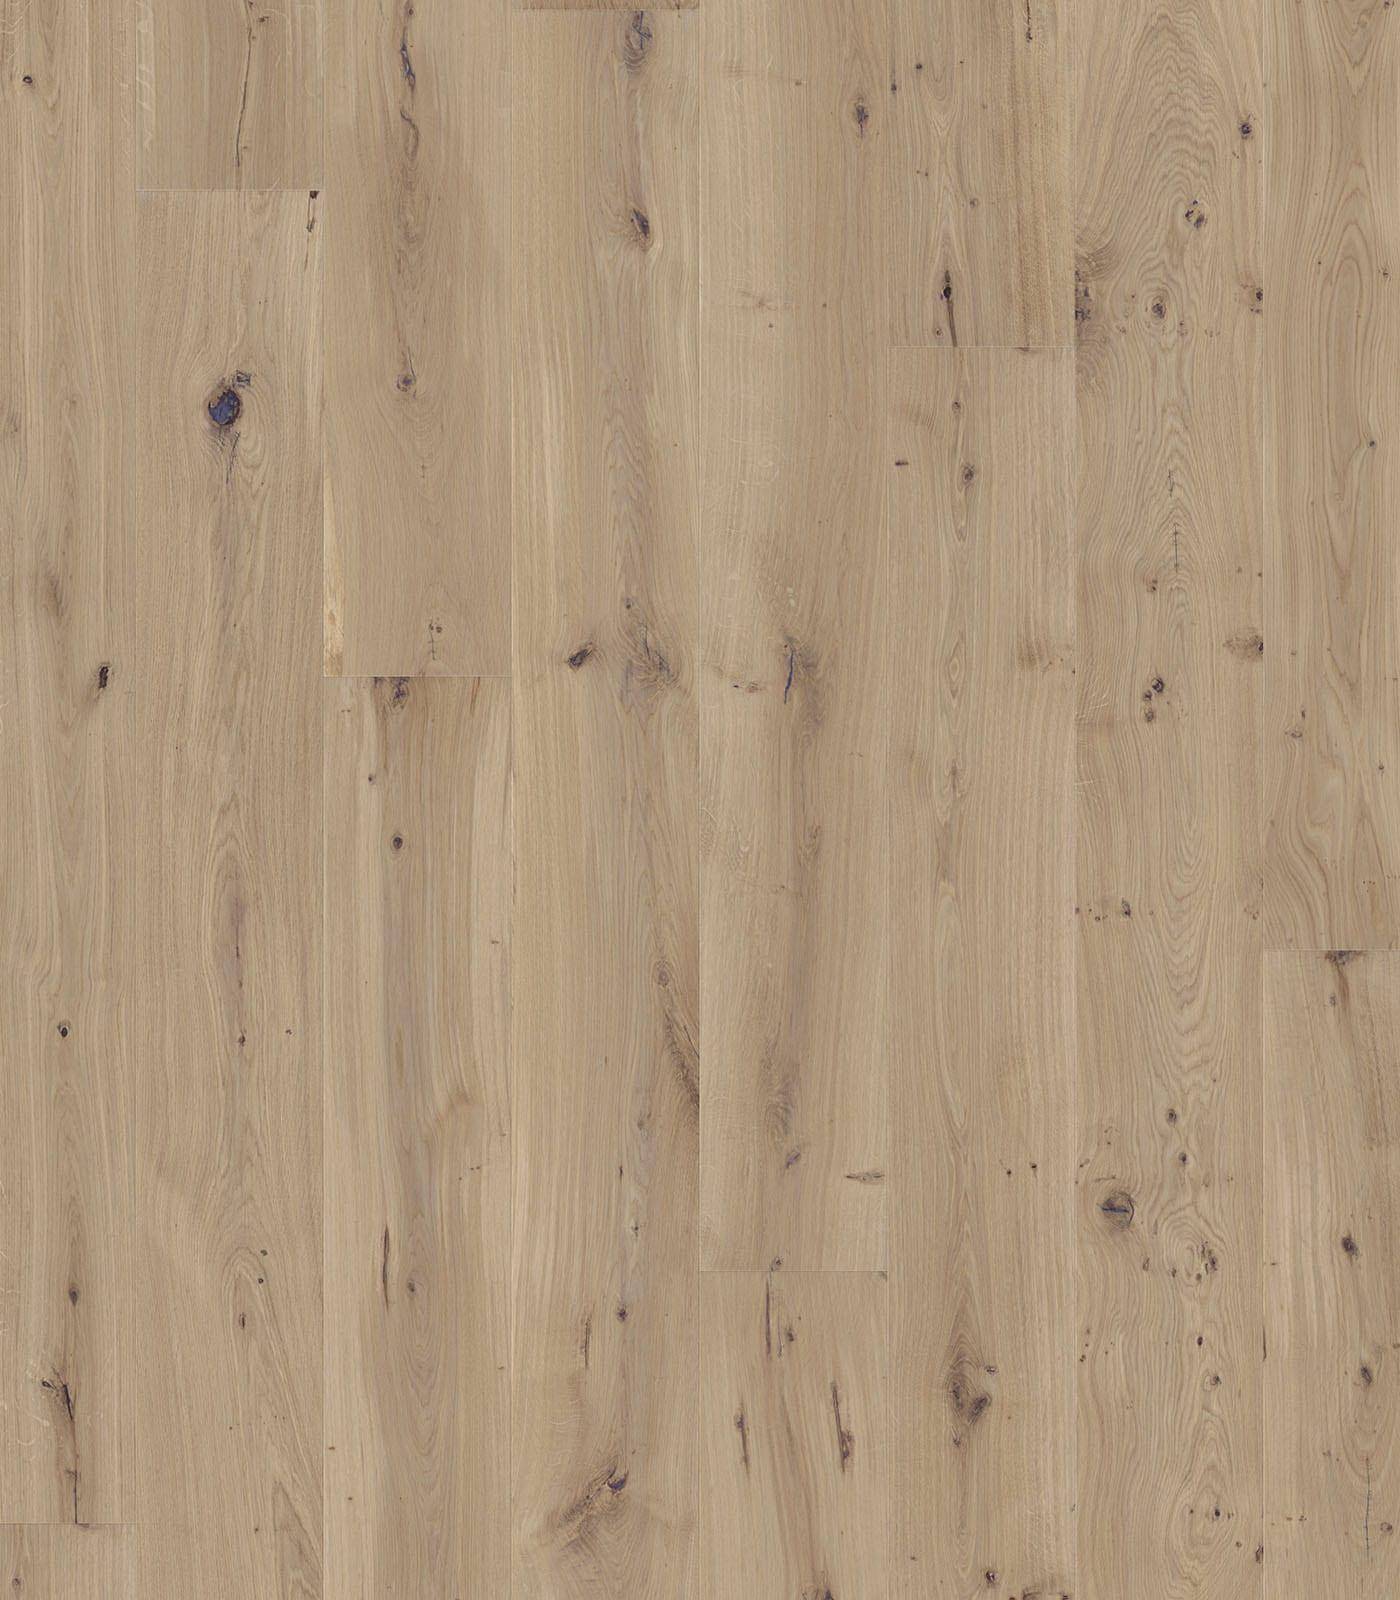 Oak Polos-Origins Collection-European Oak Floors-flat